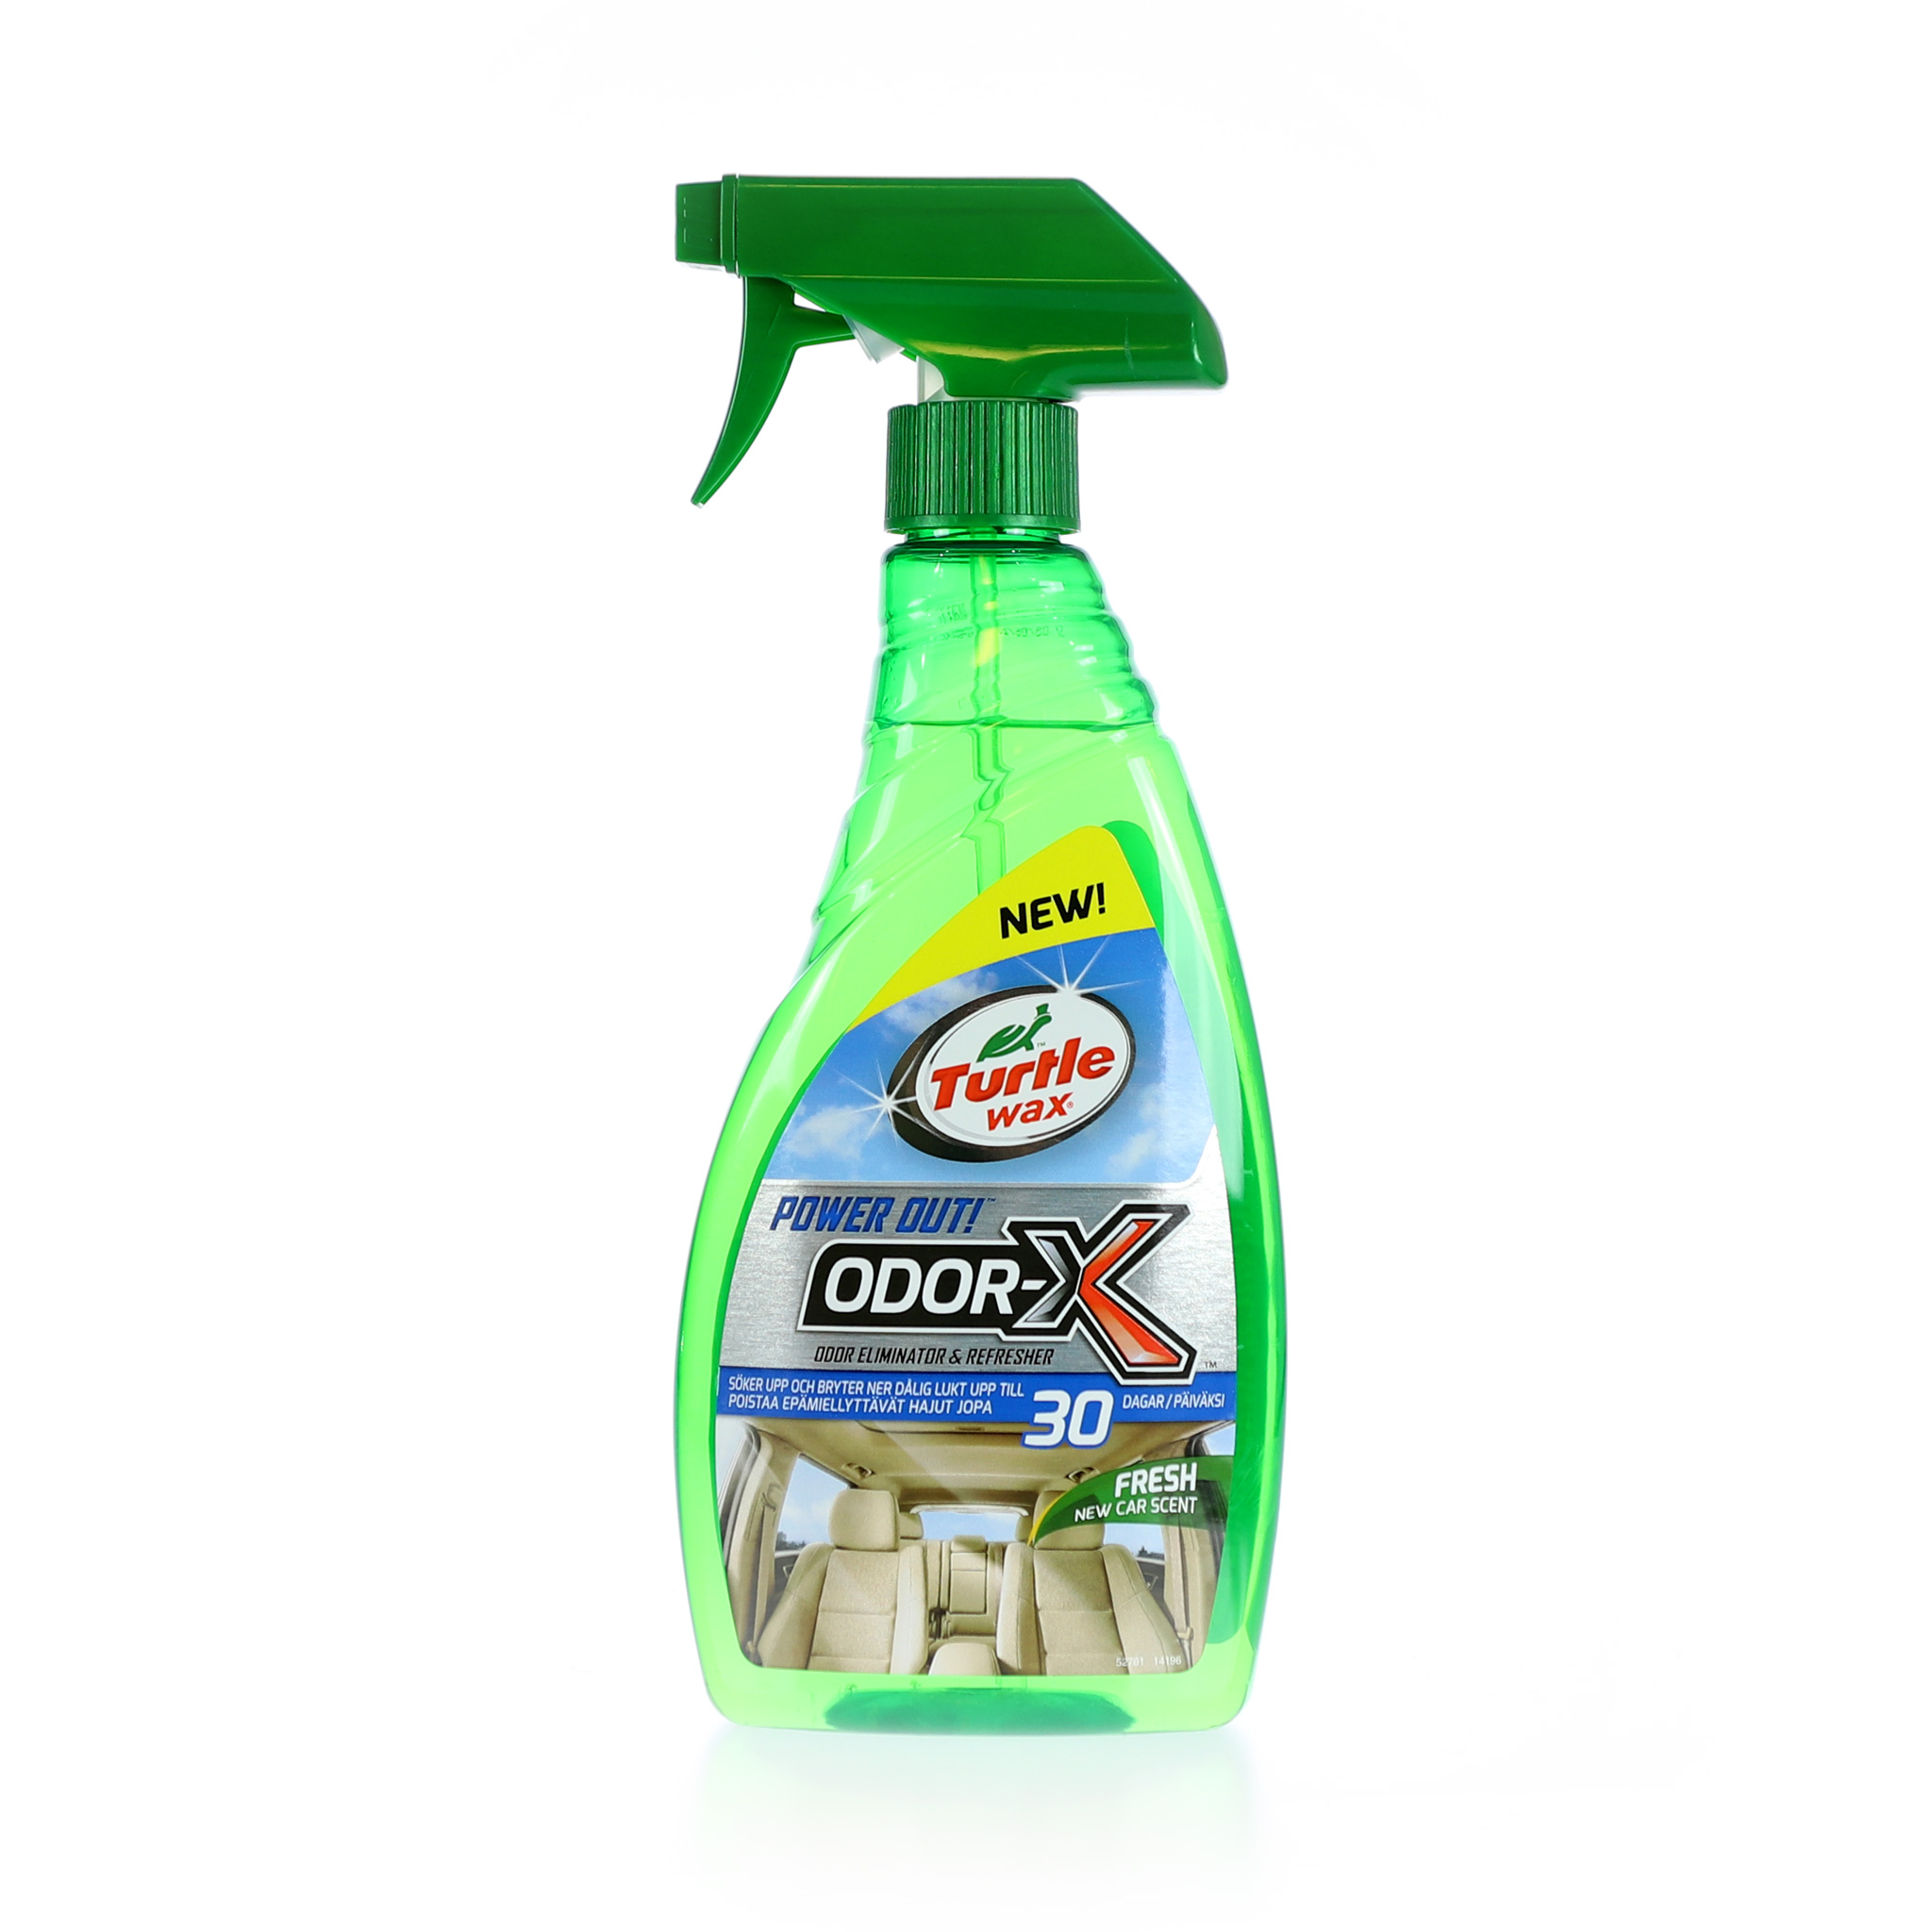 Luktborttagare Turtle Wax Odor-X Odor Eliminator & Refresher, 500 ml